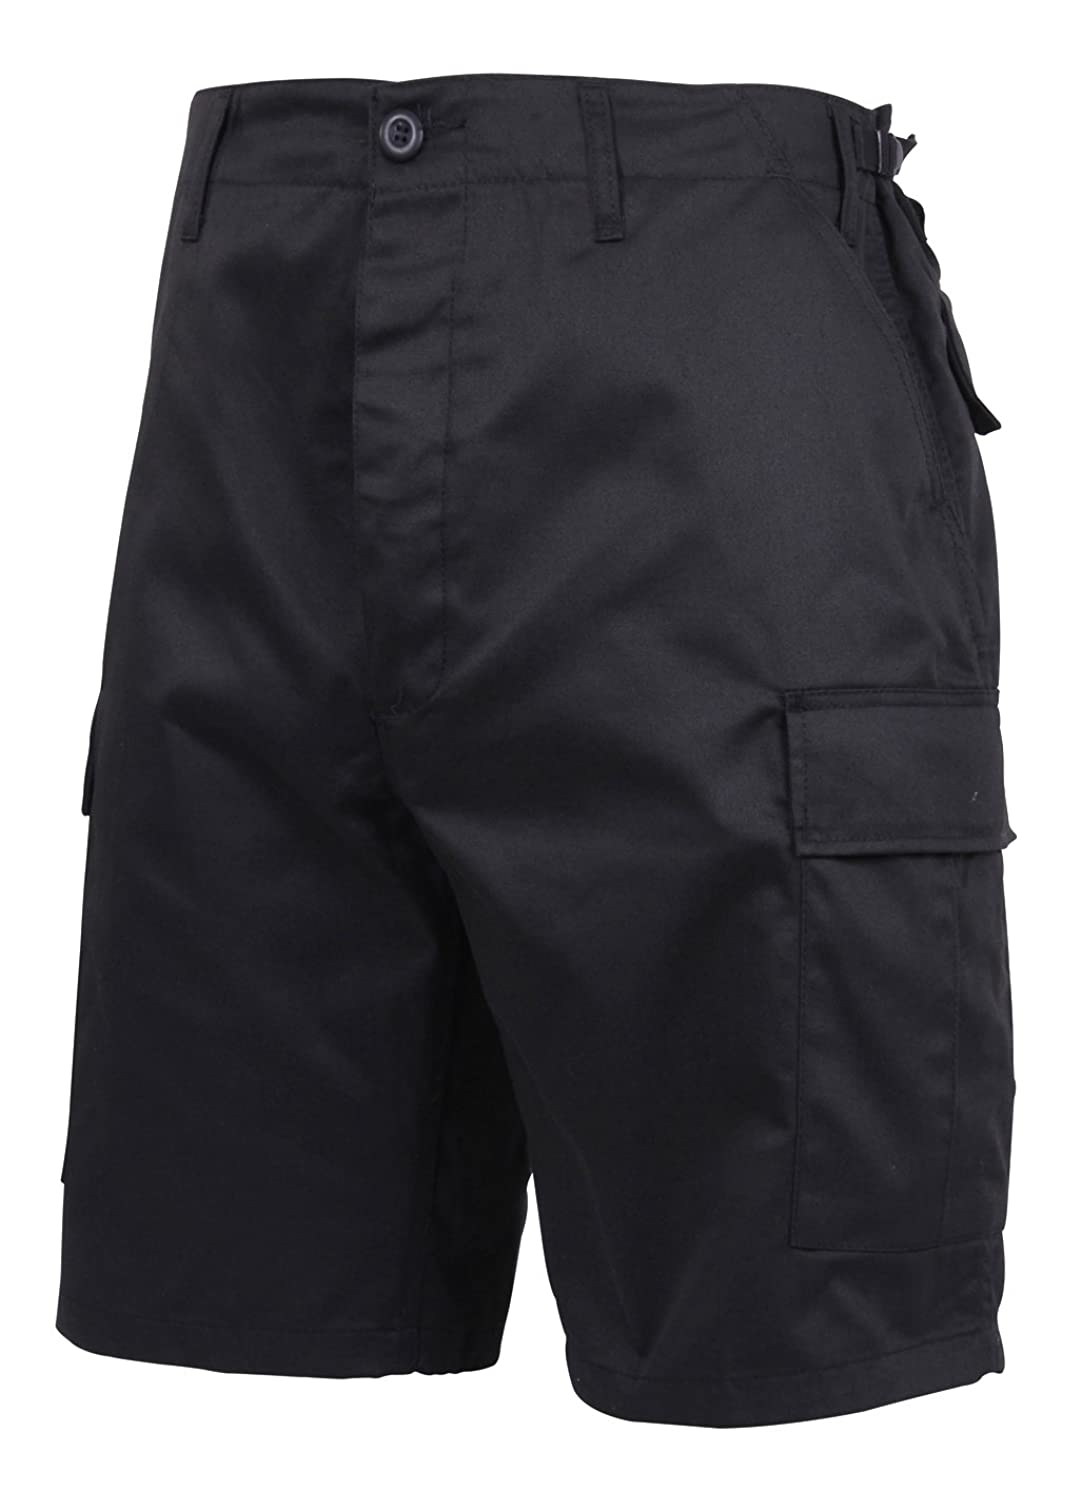 Rothco Zipper Fly BDU Shorts